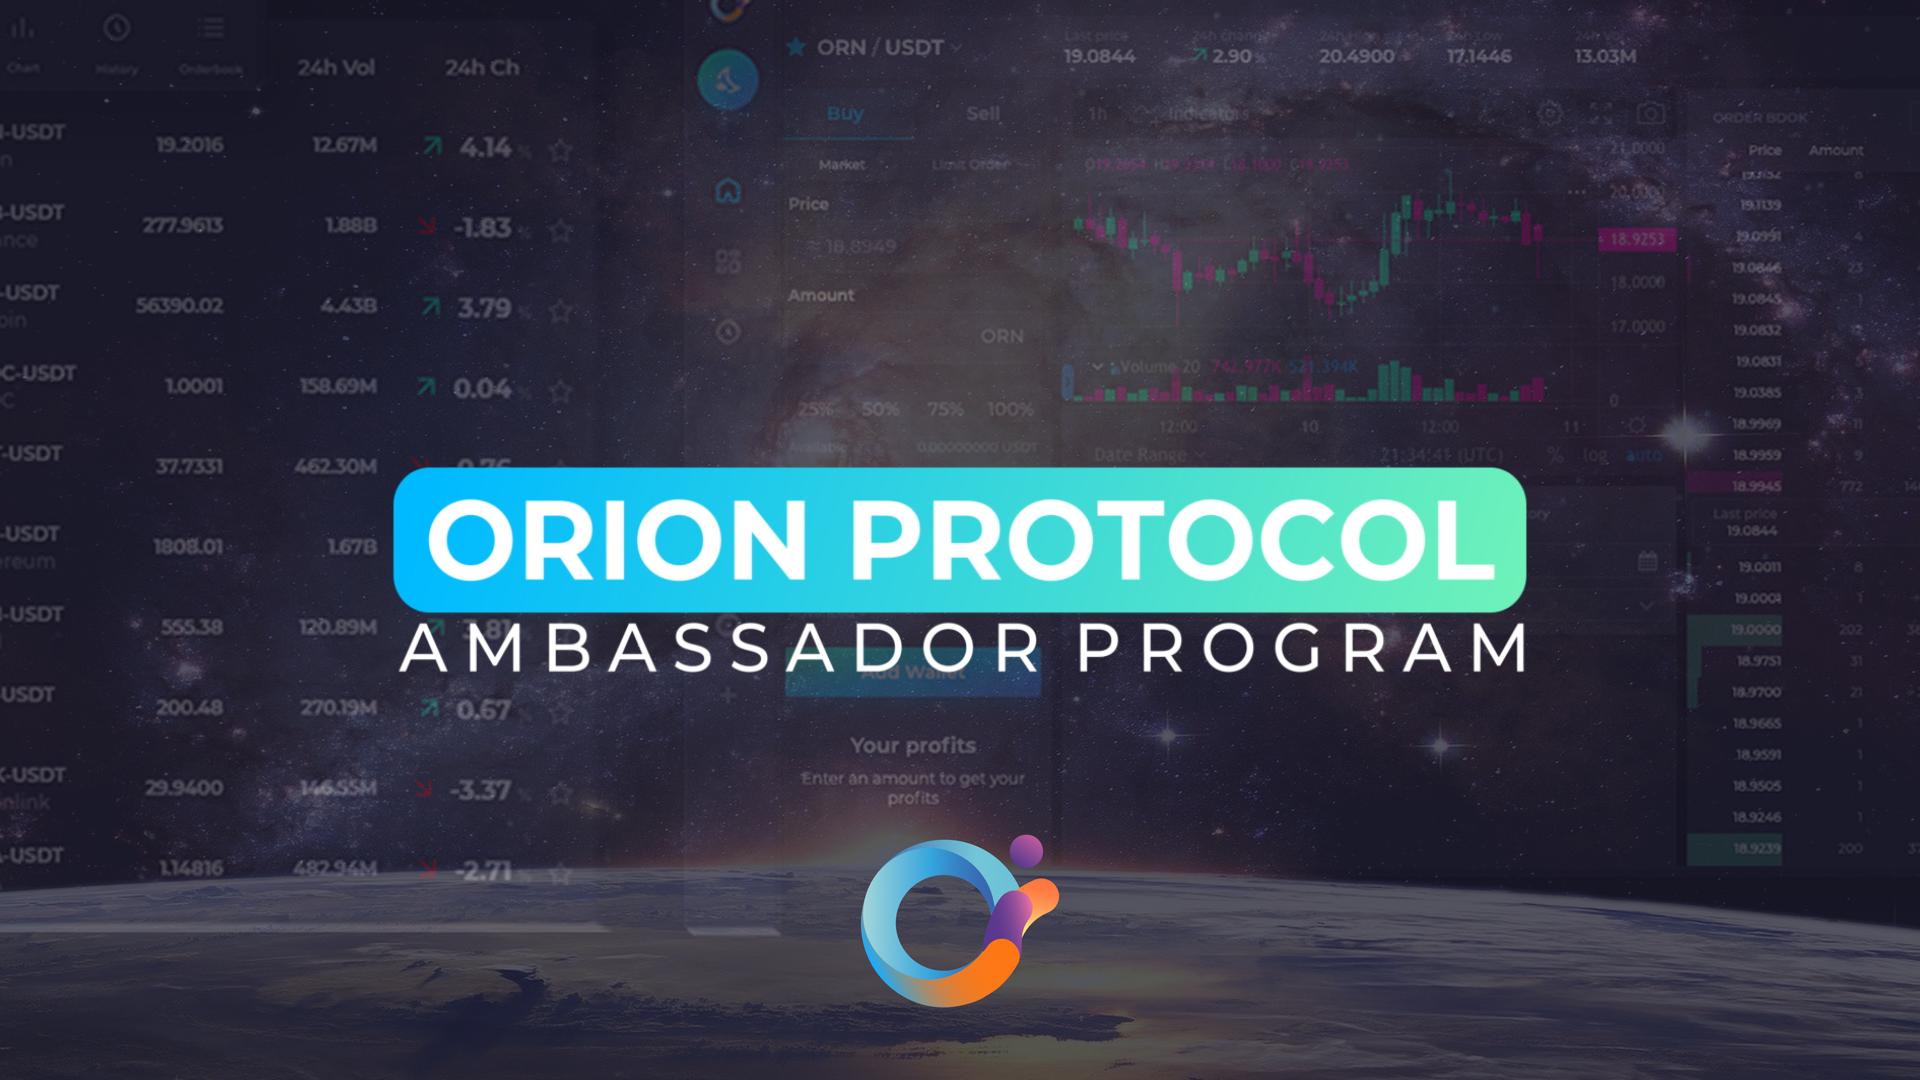 Orion Protocol Ambassadors